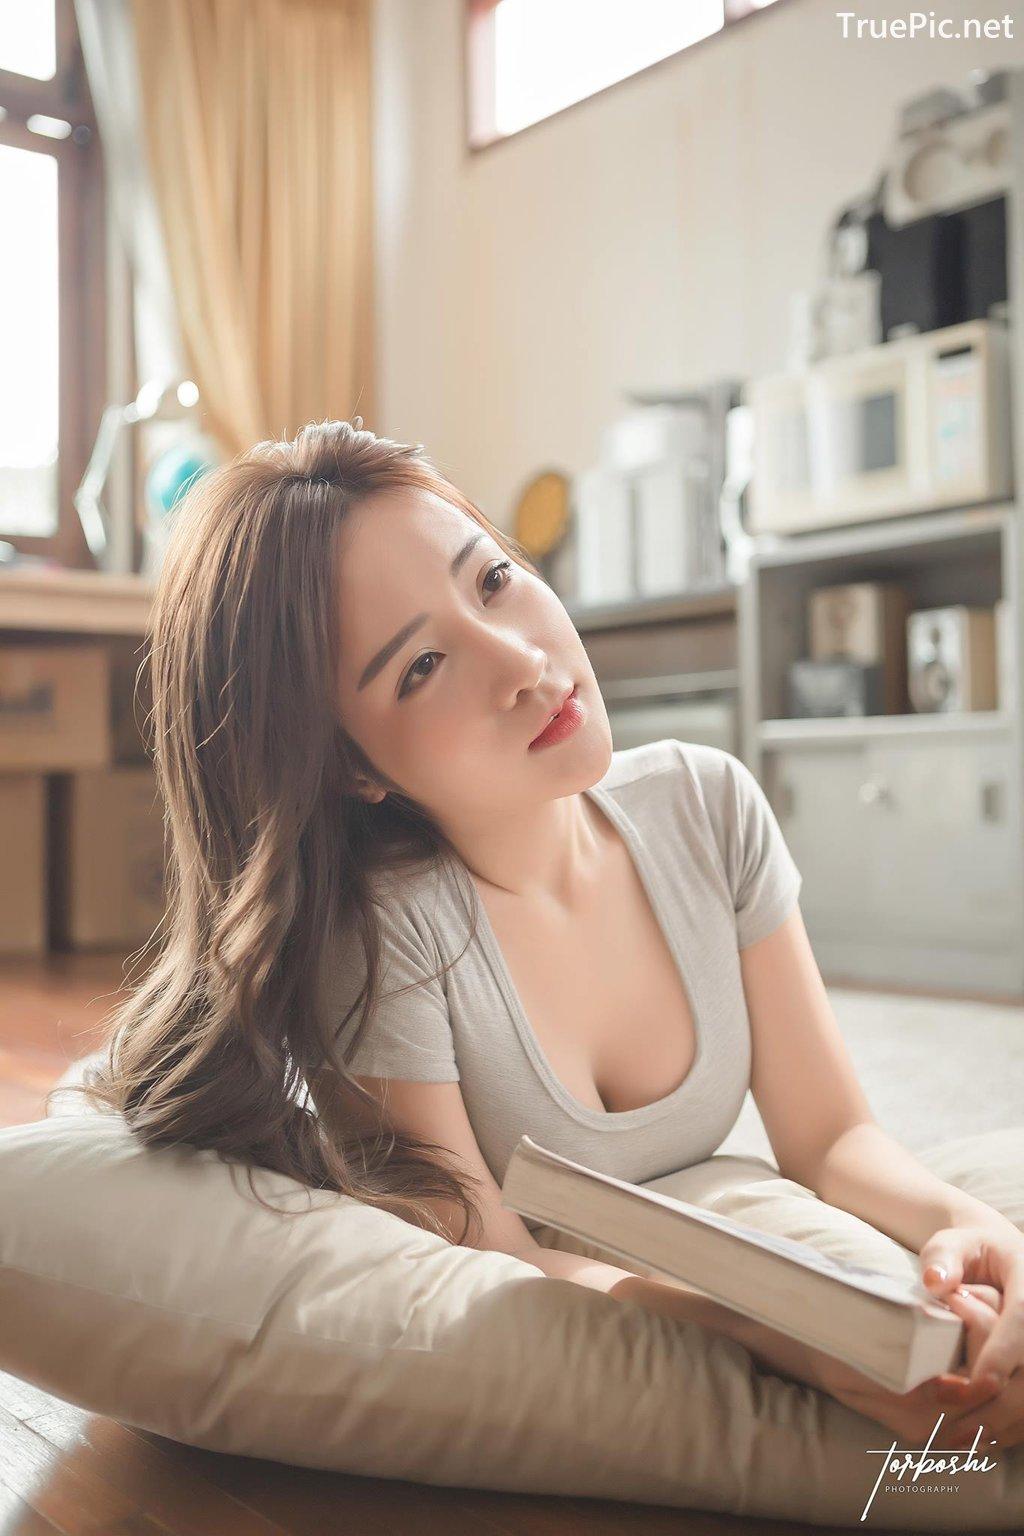 Image Thailand Model - Thanyarat Charoenpornkittada - A Girl Like You - TruePic.net - Picture-8